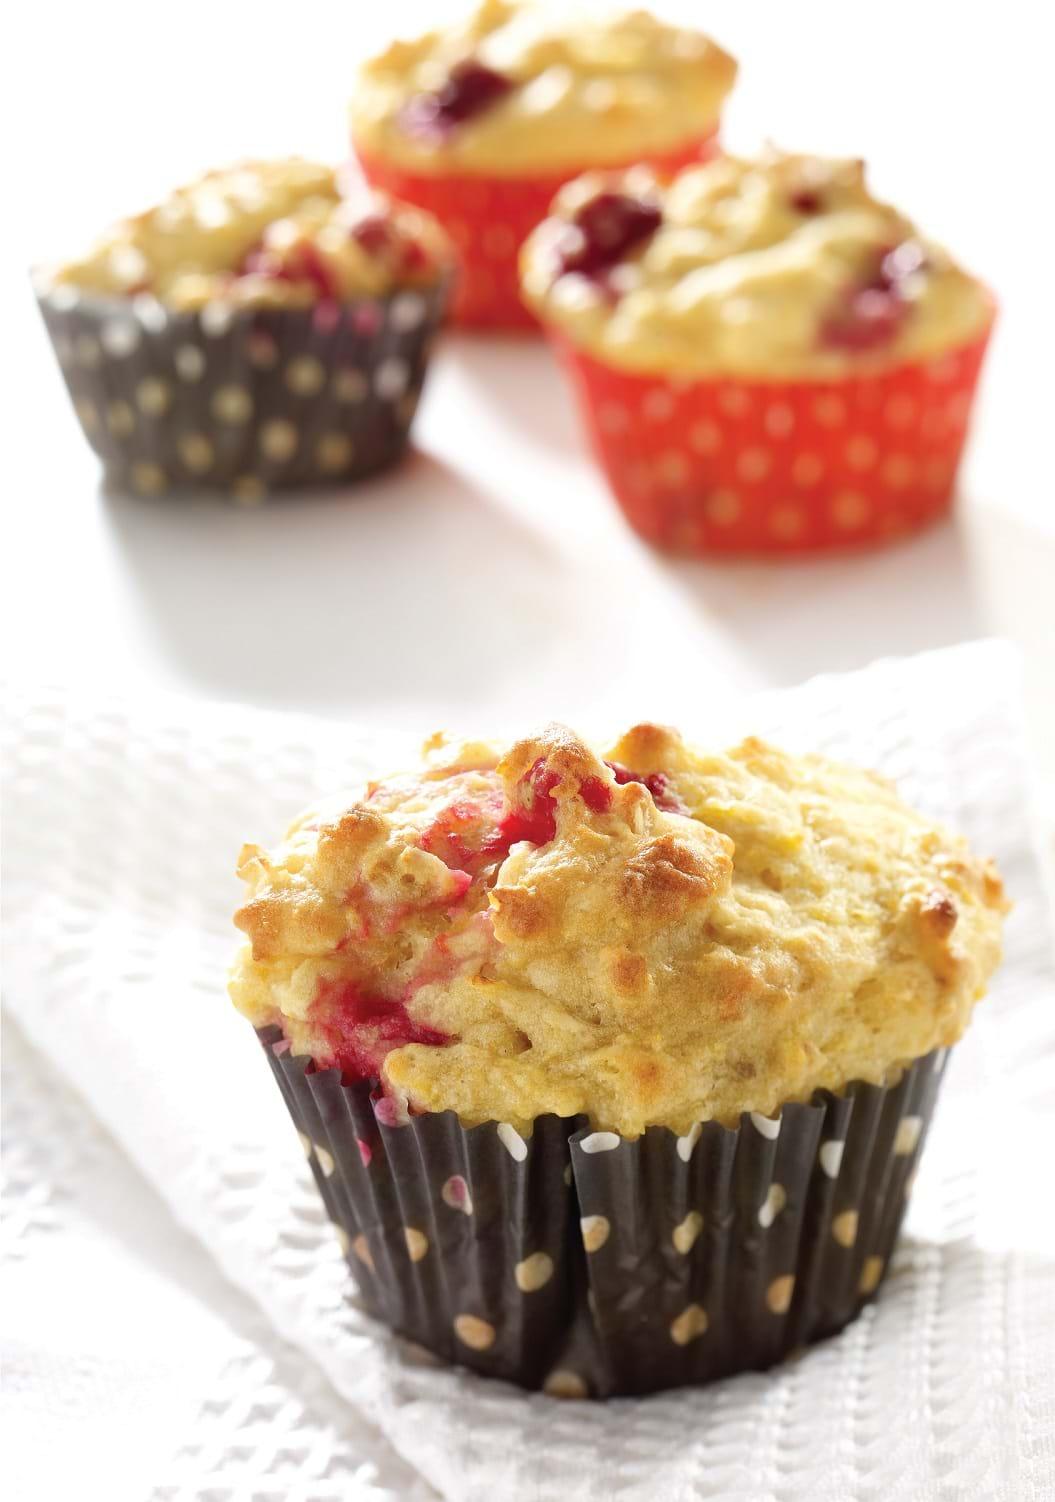 recettes sant nutrisimple muffins aux canneberges et. Black Bedroom Furniture Sets. Home Design Ideas